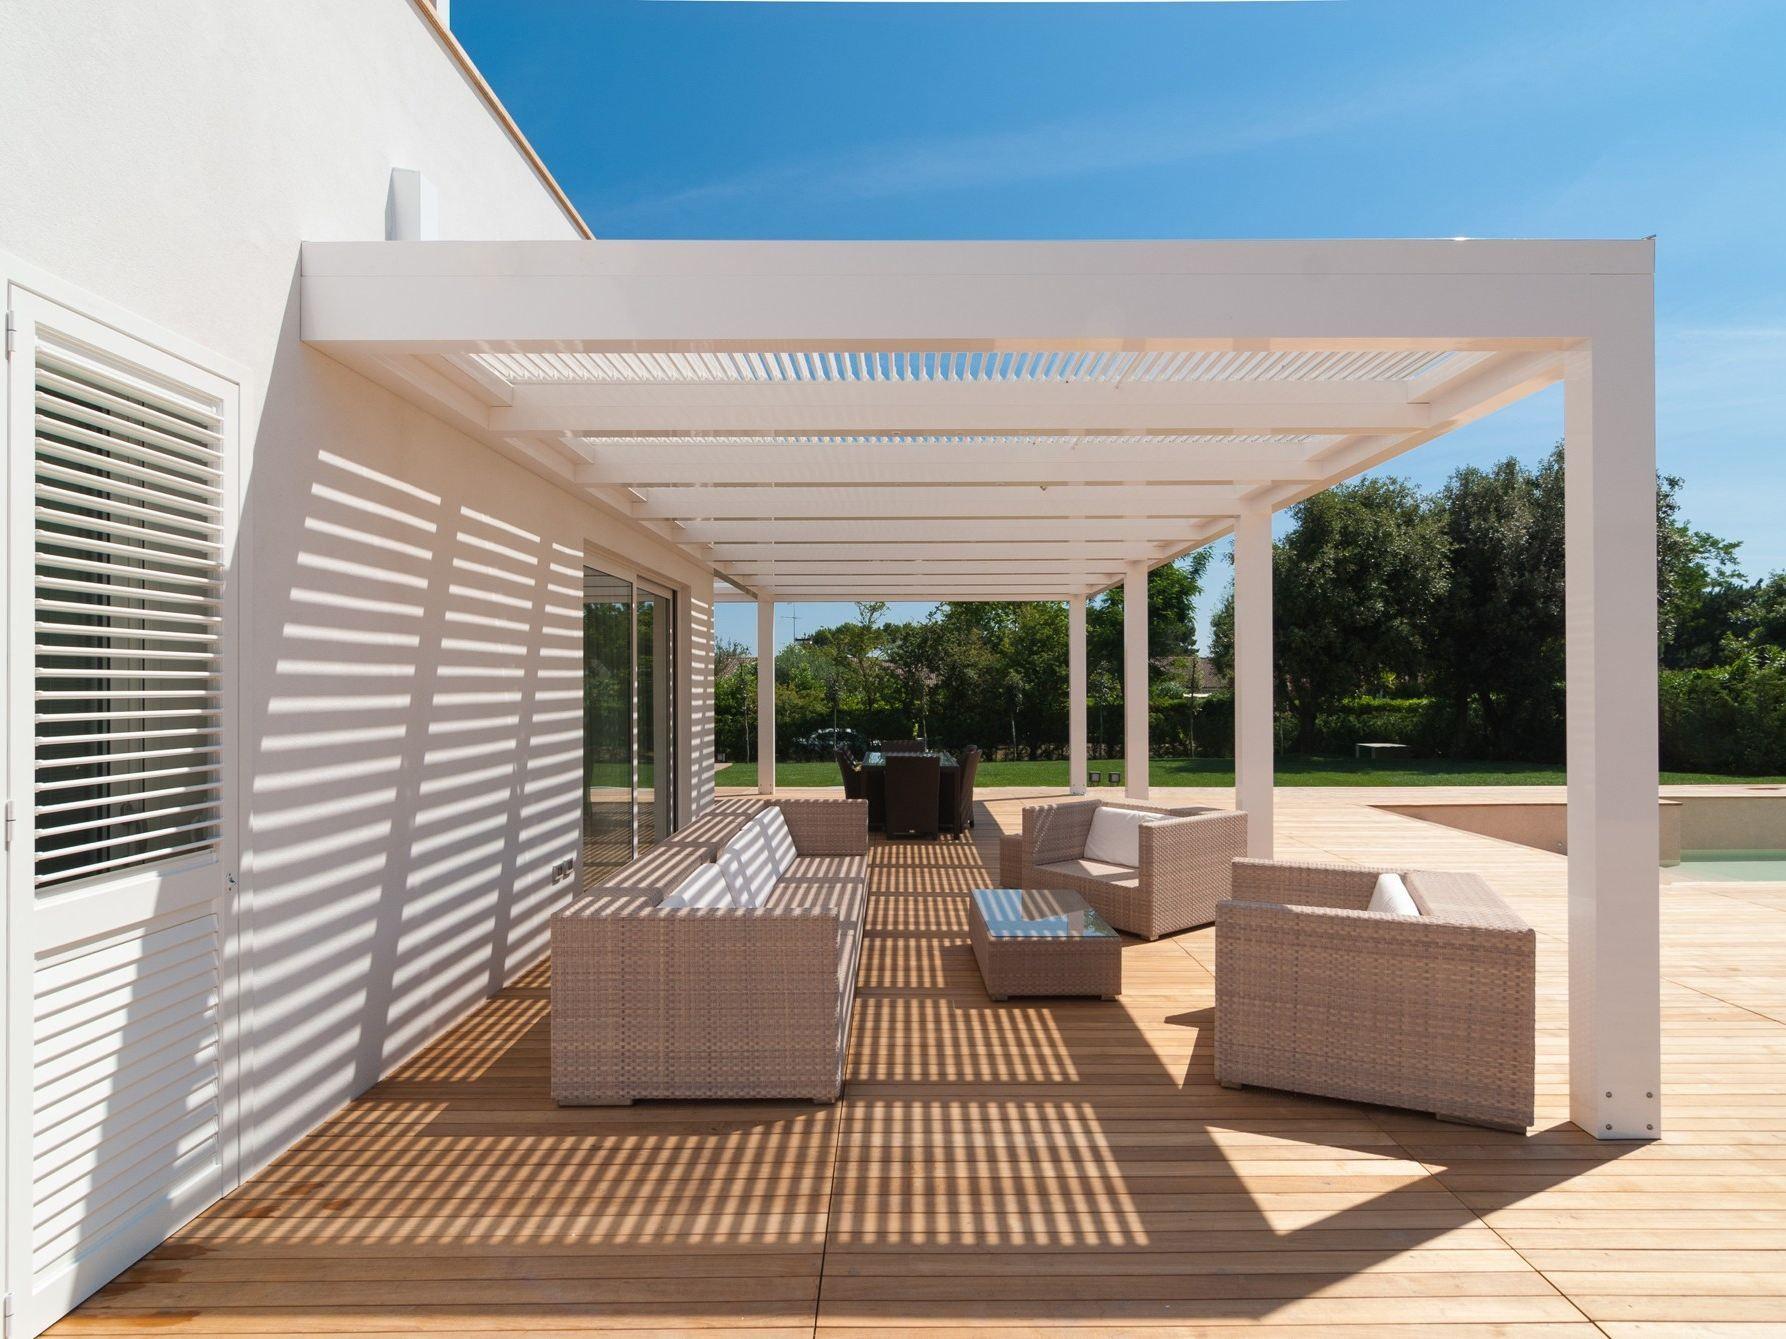 tarif pergola biossun excellent combinaison pergola et. Black Bedroom Furniture Sets. Home Design Ideas